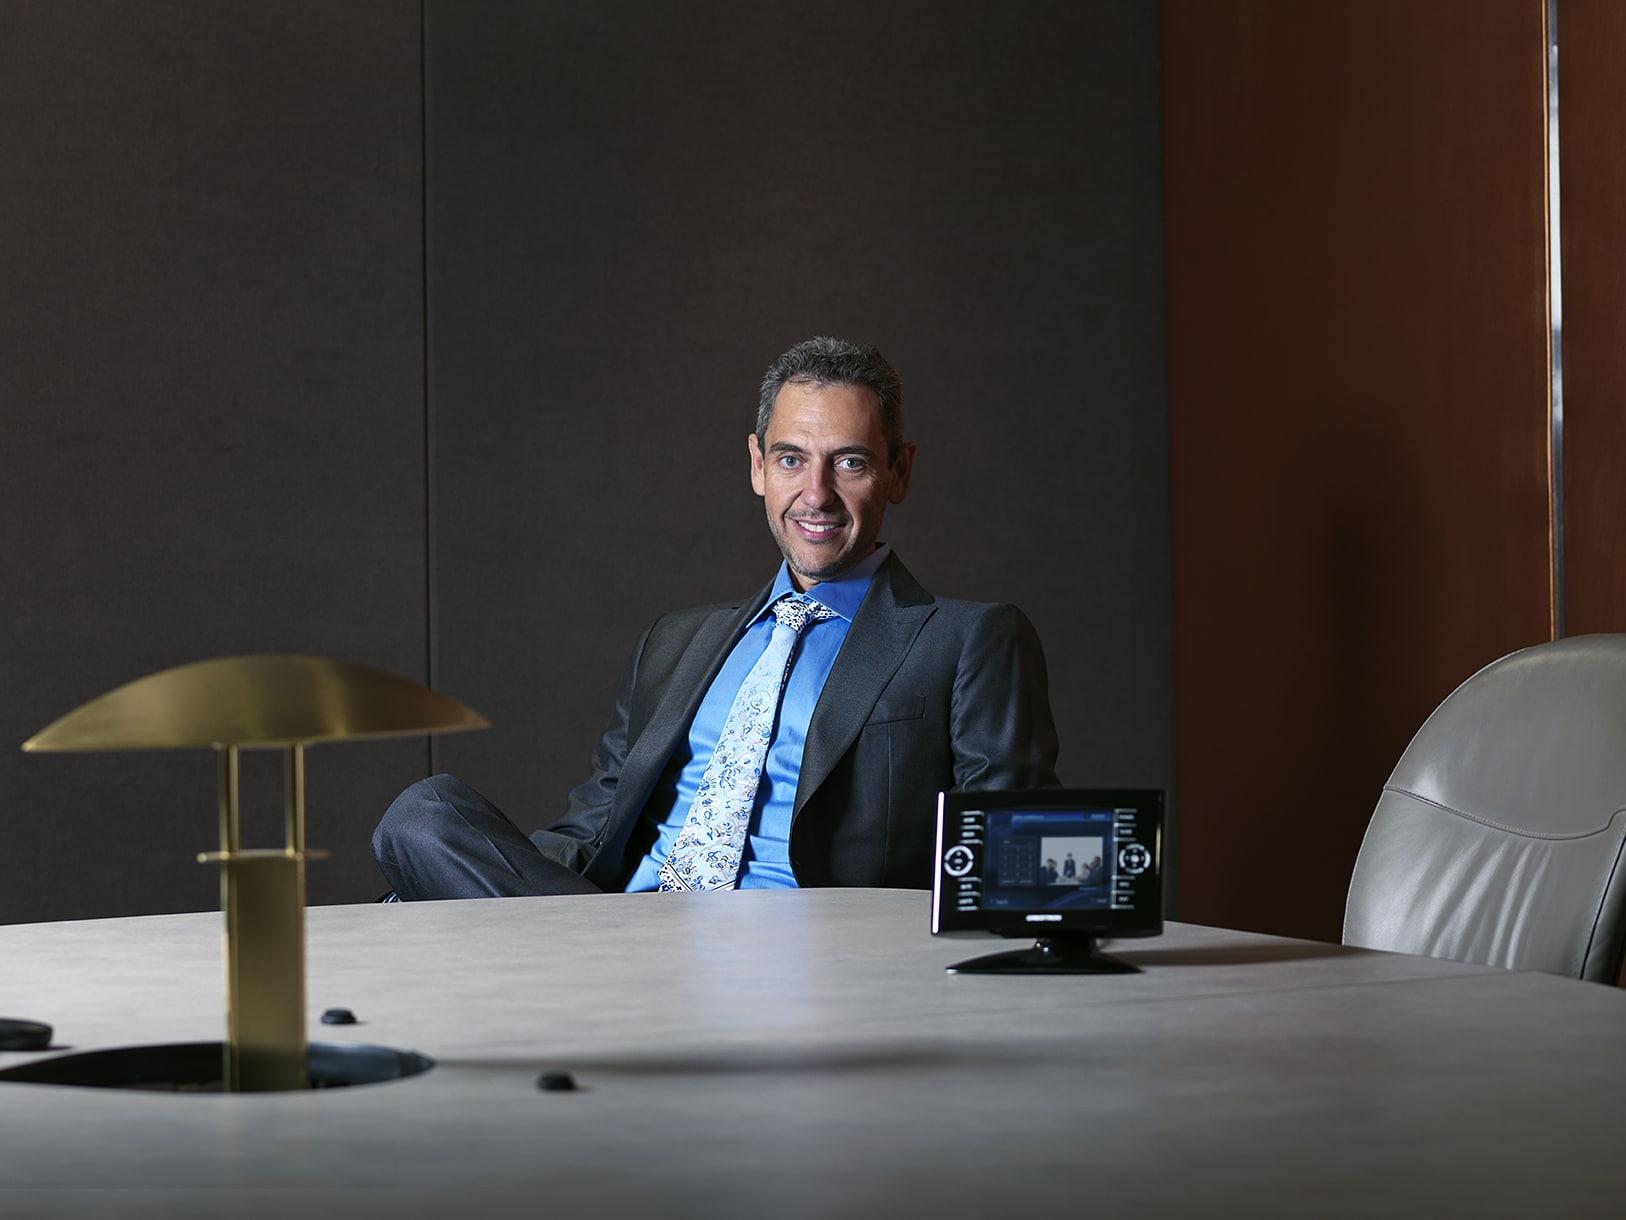 Federico Bausone Multimedia Care